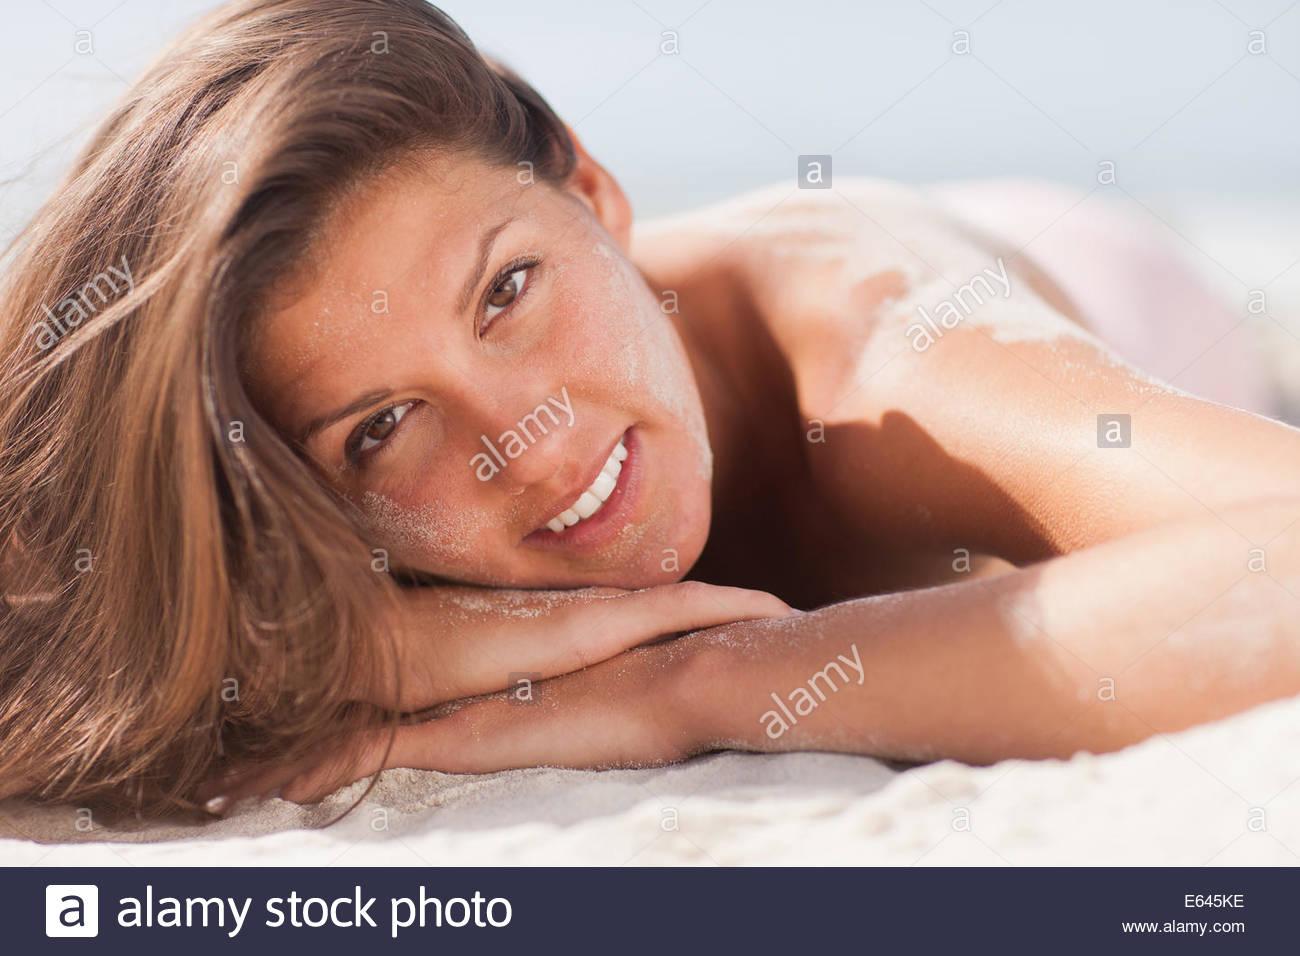 Woman sunbathing on beach - Stock Image